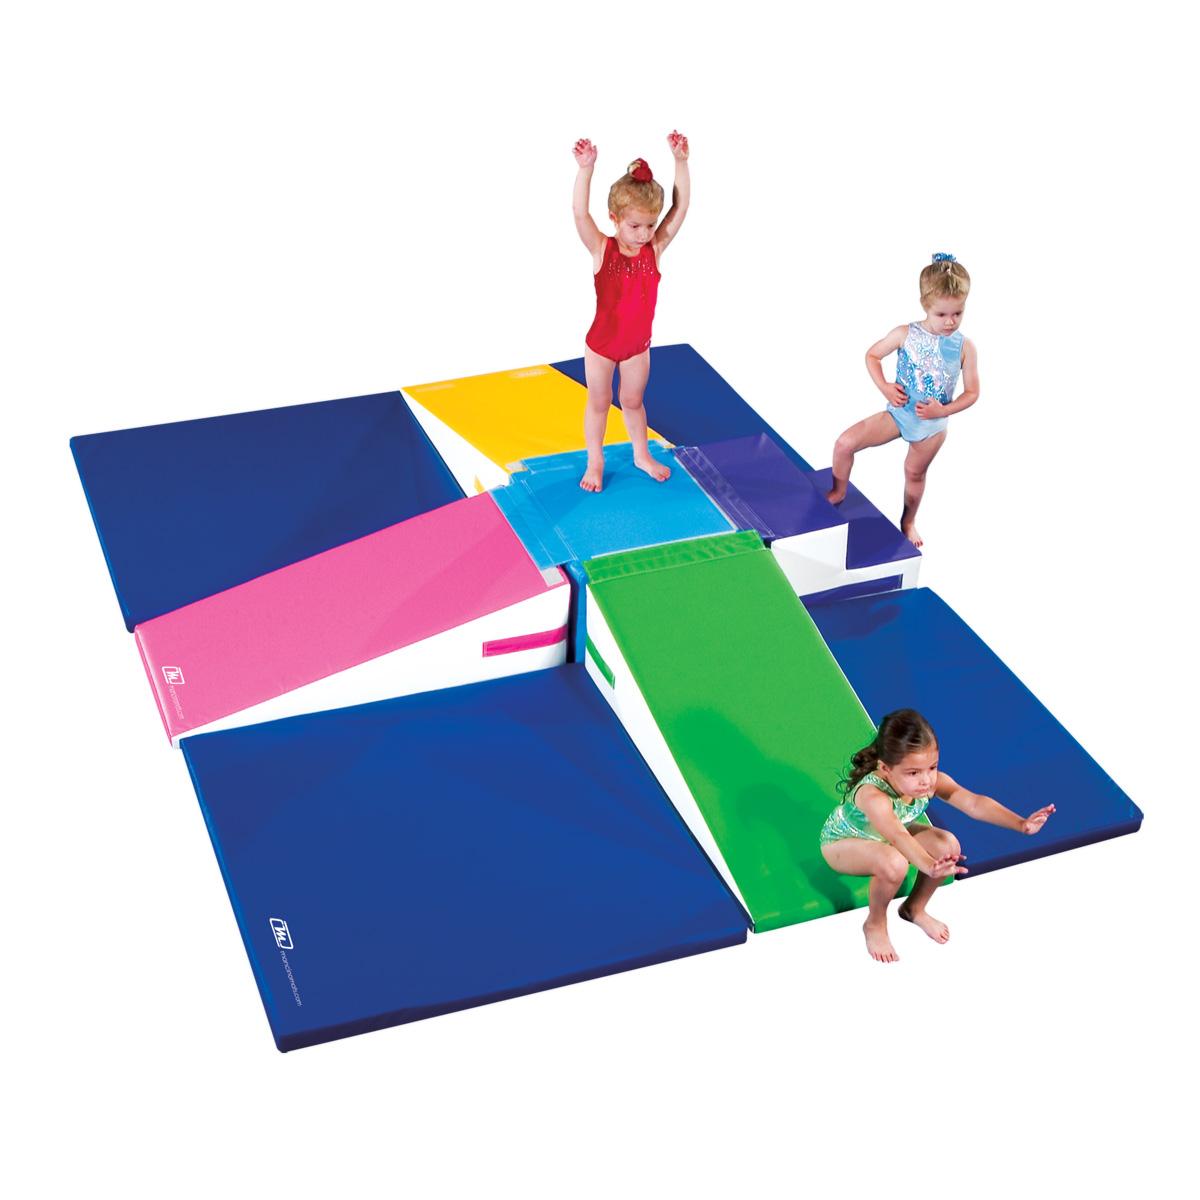 Mancino Mats tumble bear square preschoolers